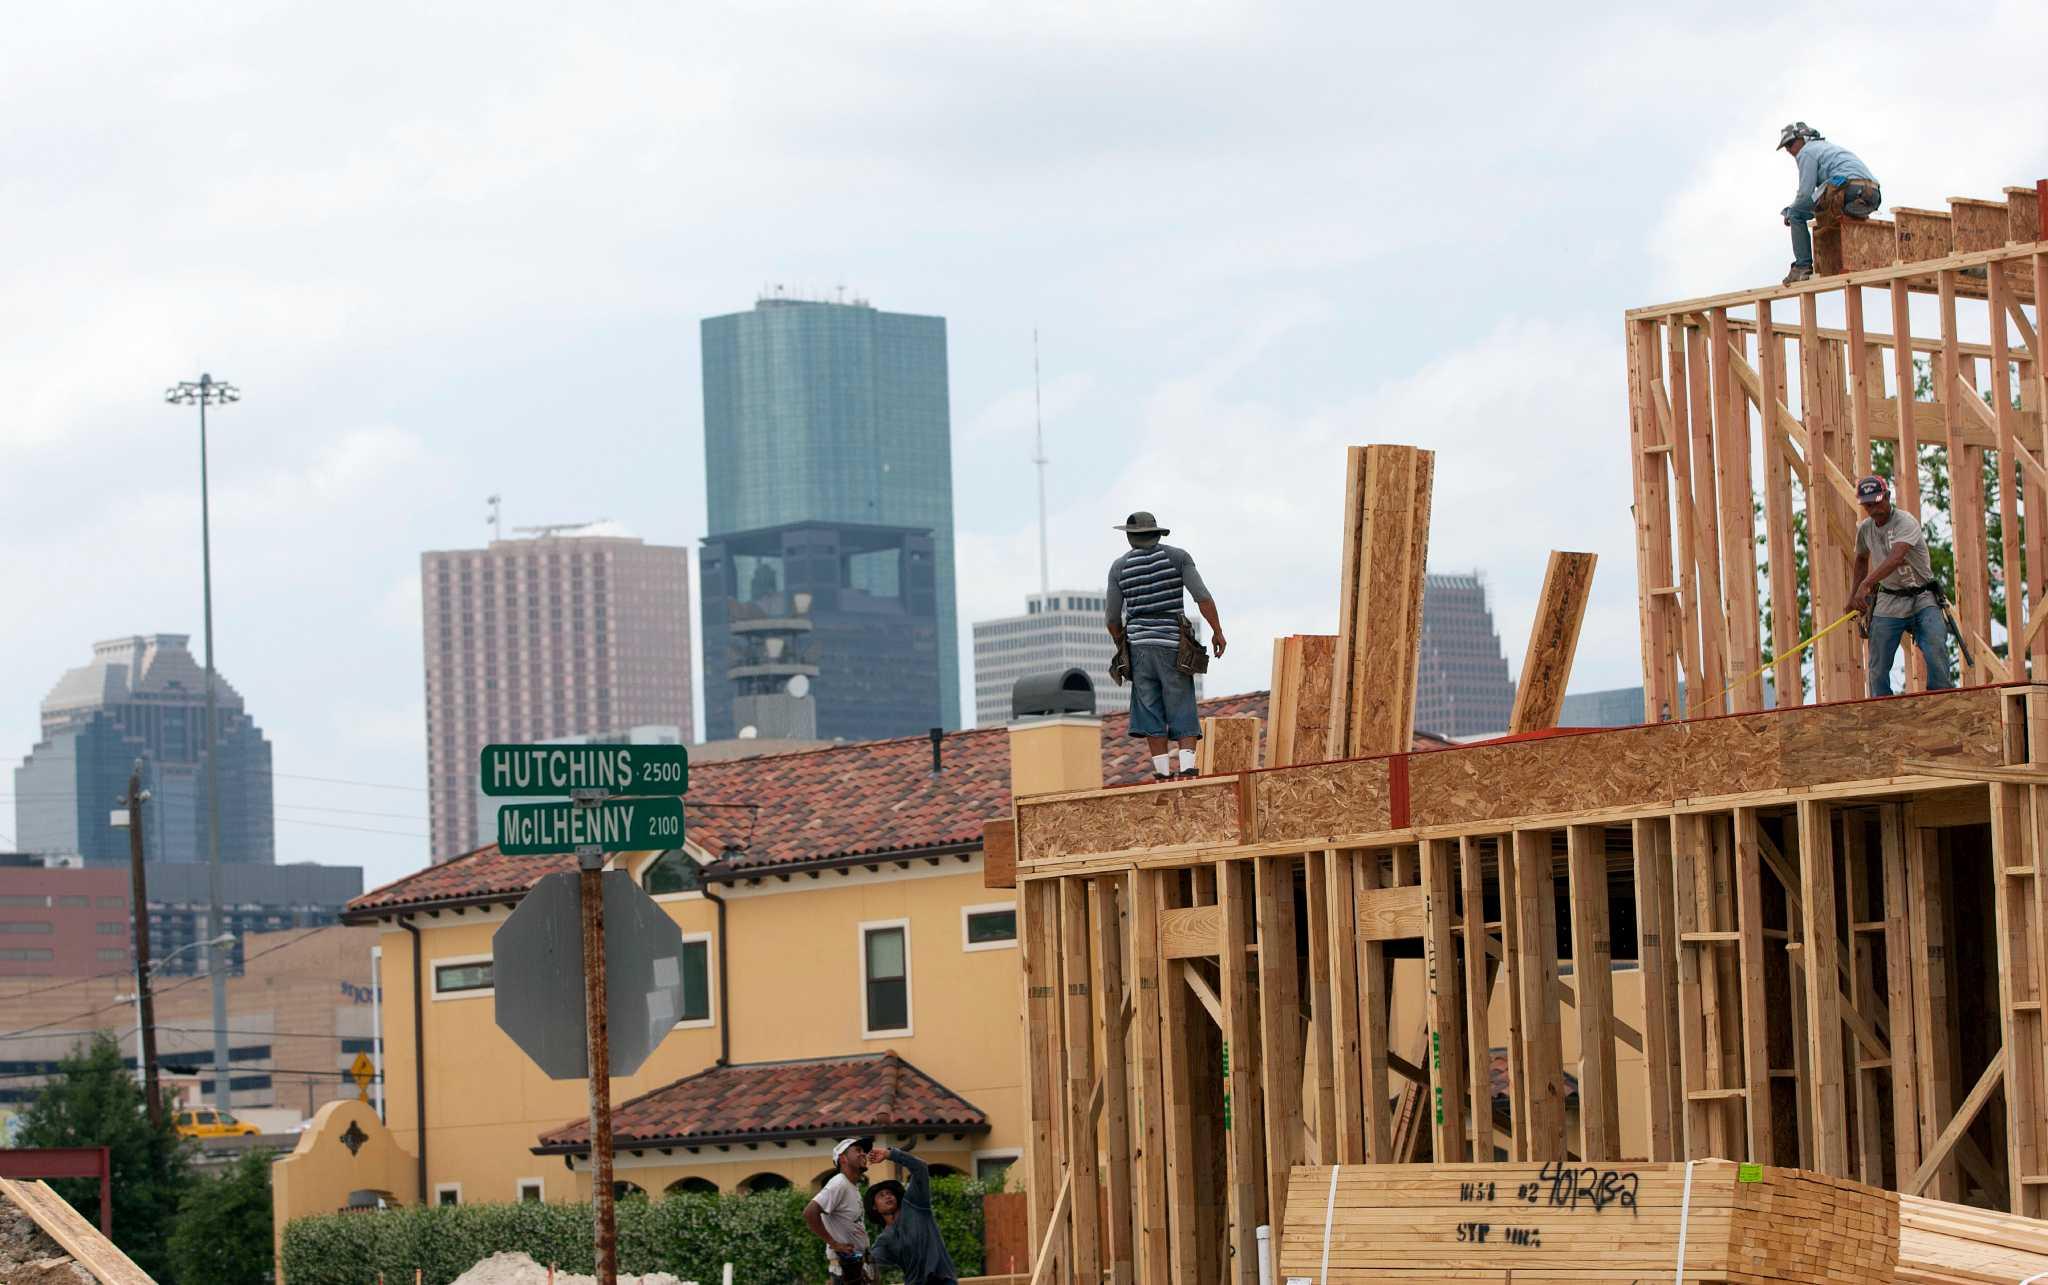 affordable housing proposal puts neighbors on edge - houston chronicle